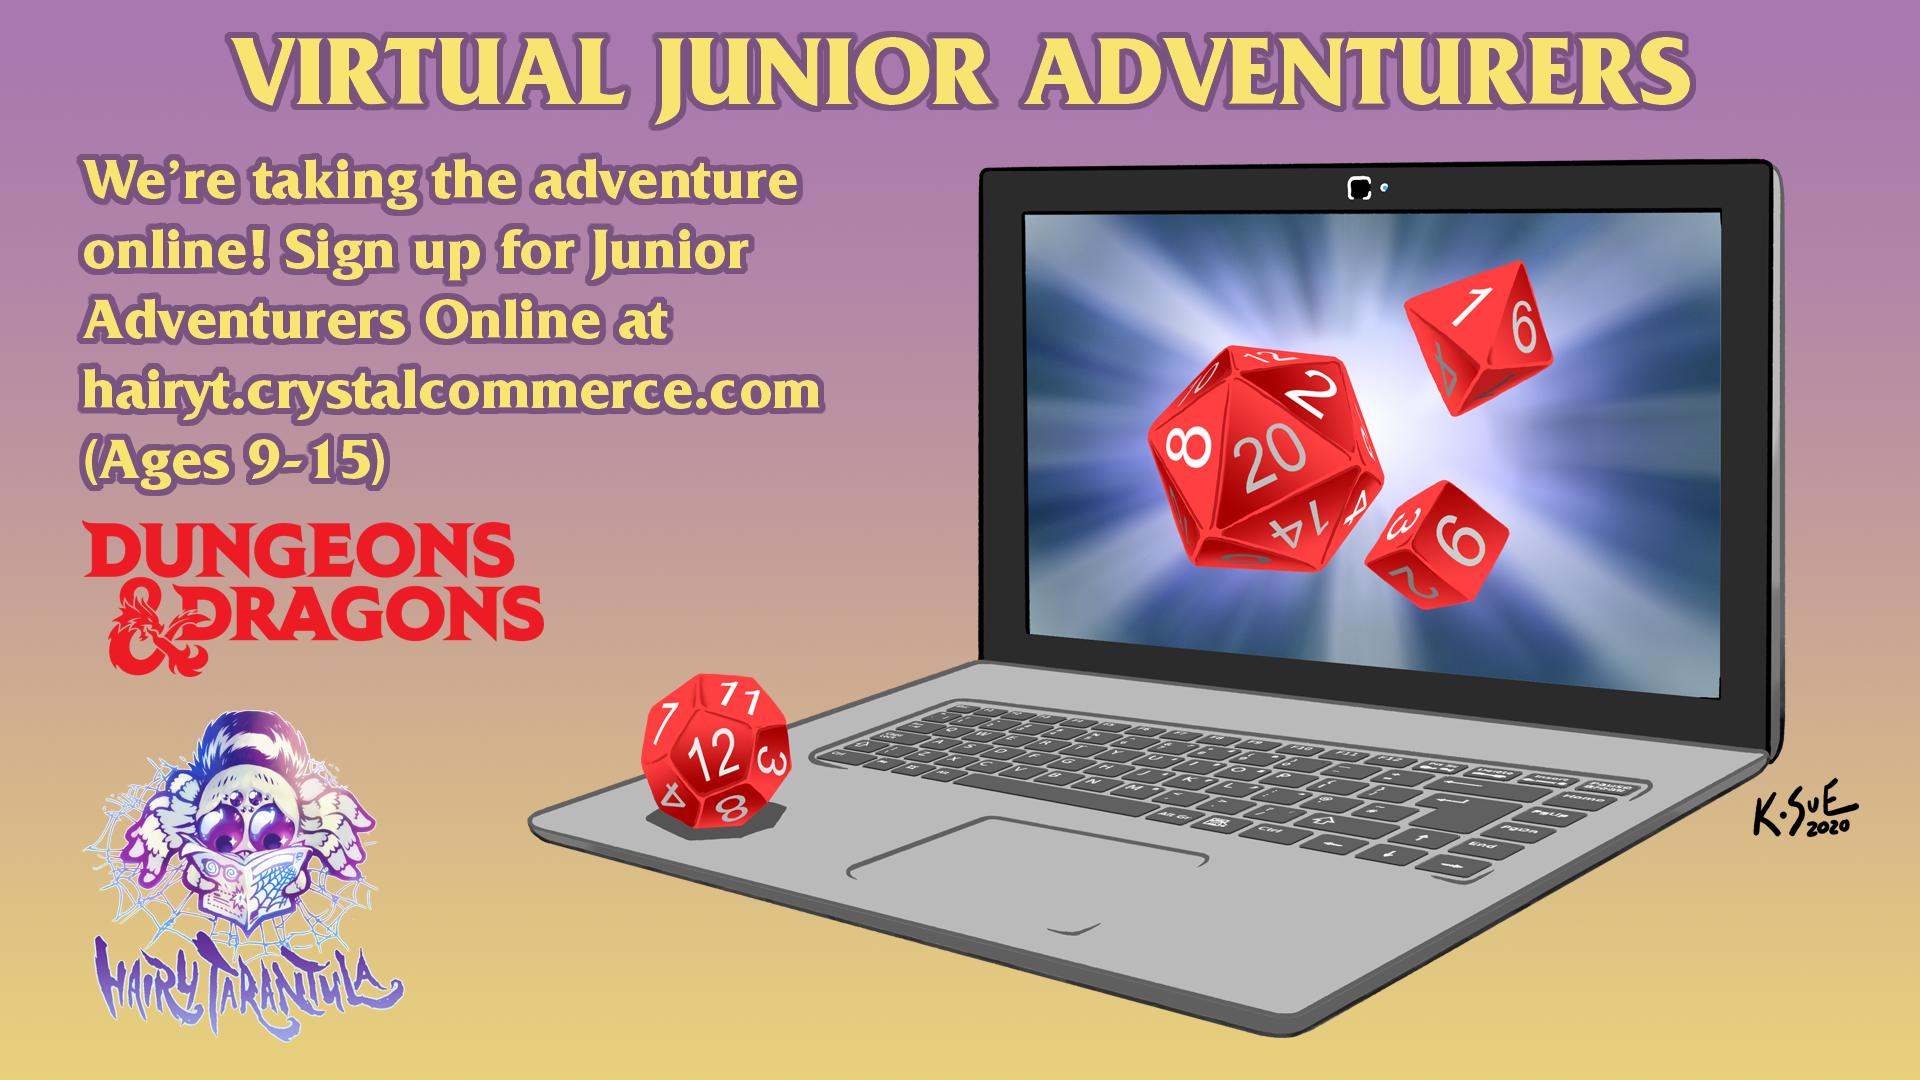 Virtual Junior Adventurers - Thursday